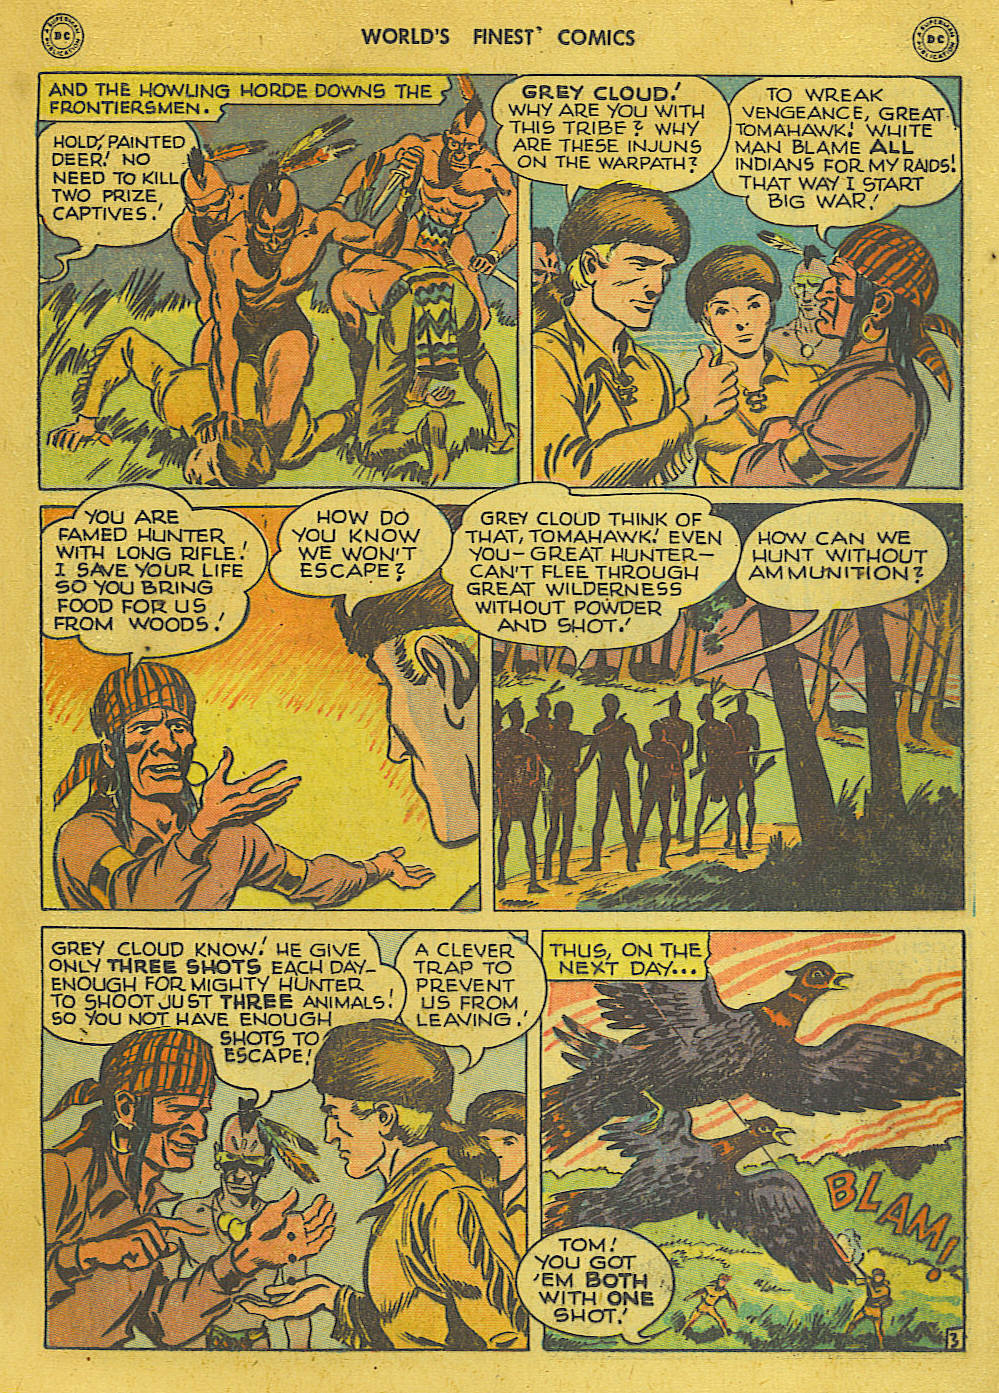 Read online World's Finest Comics comic -  Issue #34 - 19